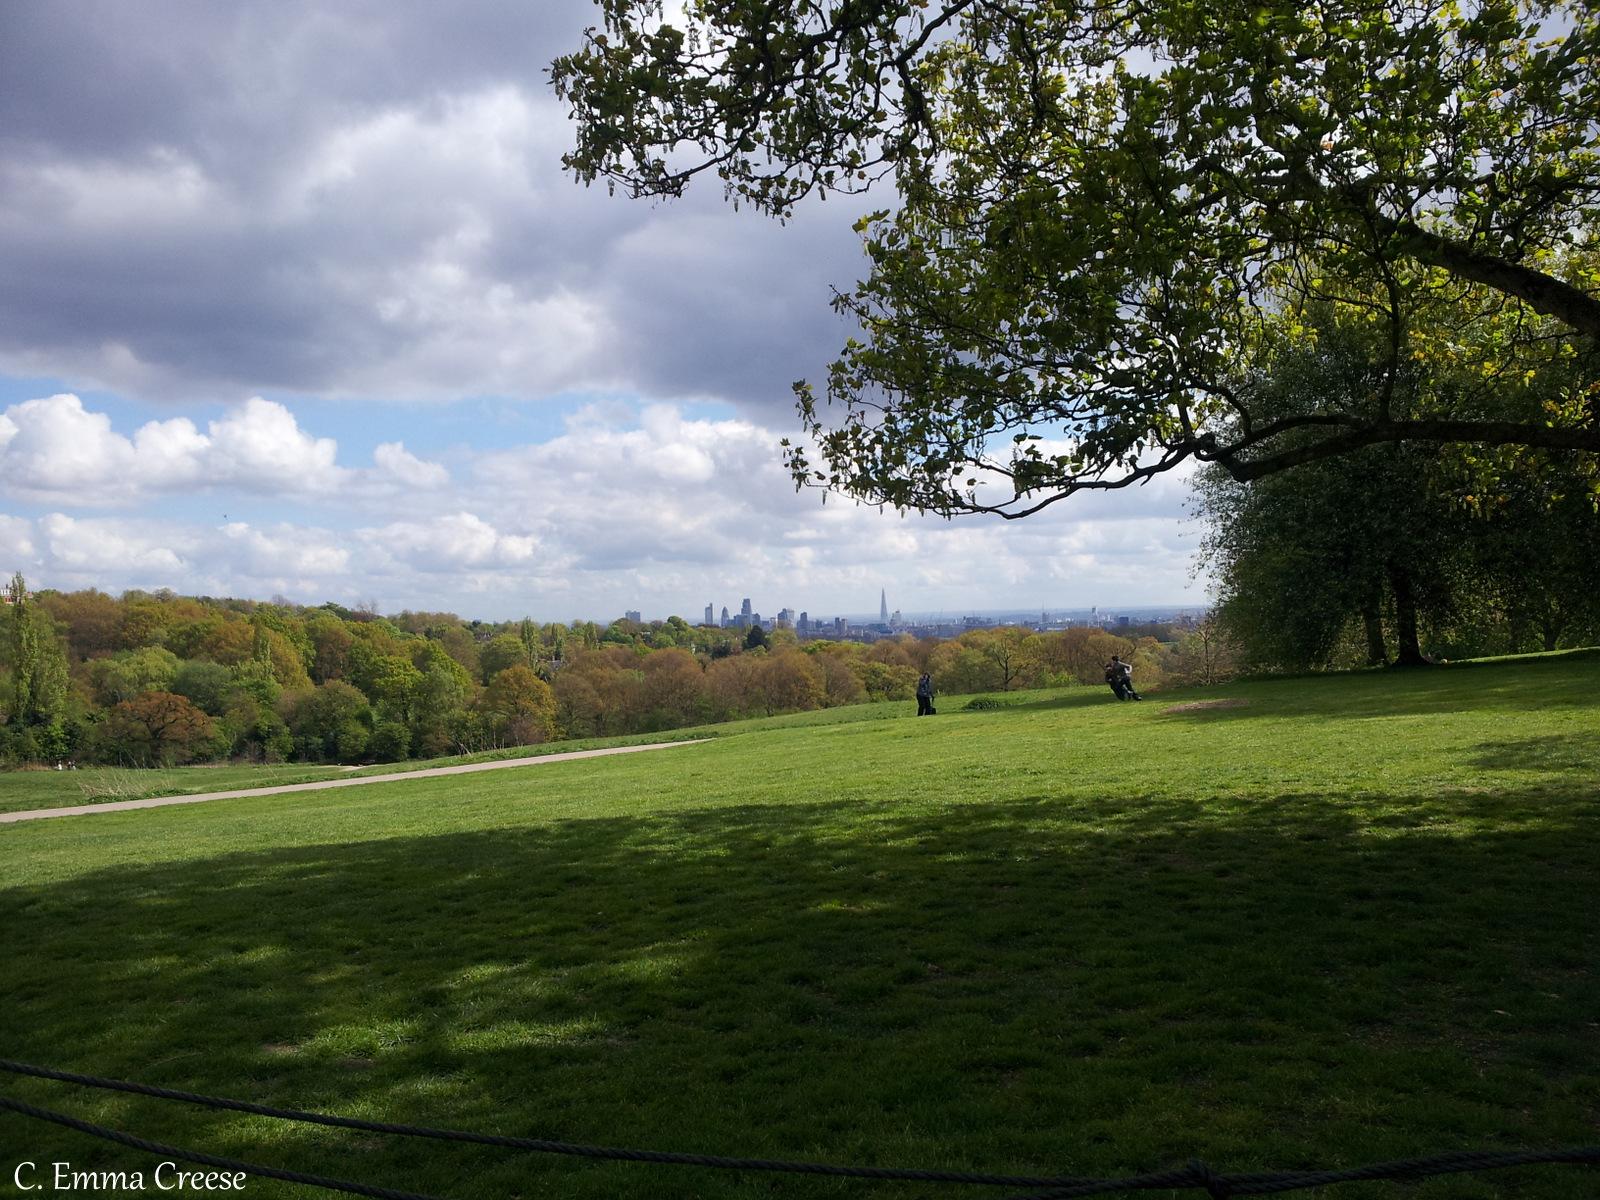 Hampstead Heath The 10 best picnic spots in London Adventures of a London Kiwi